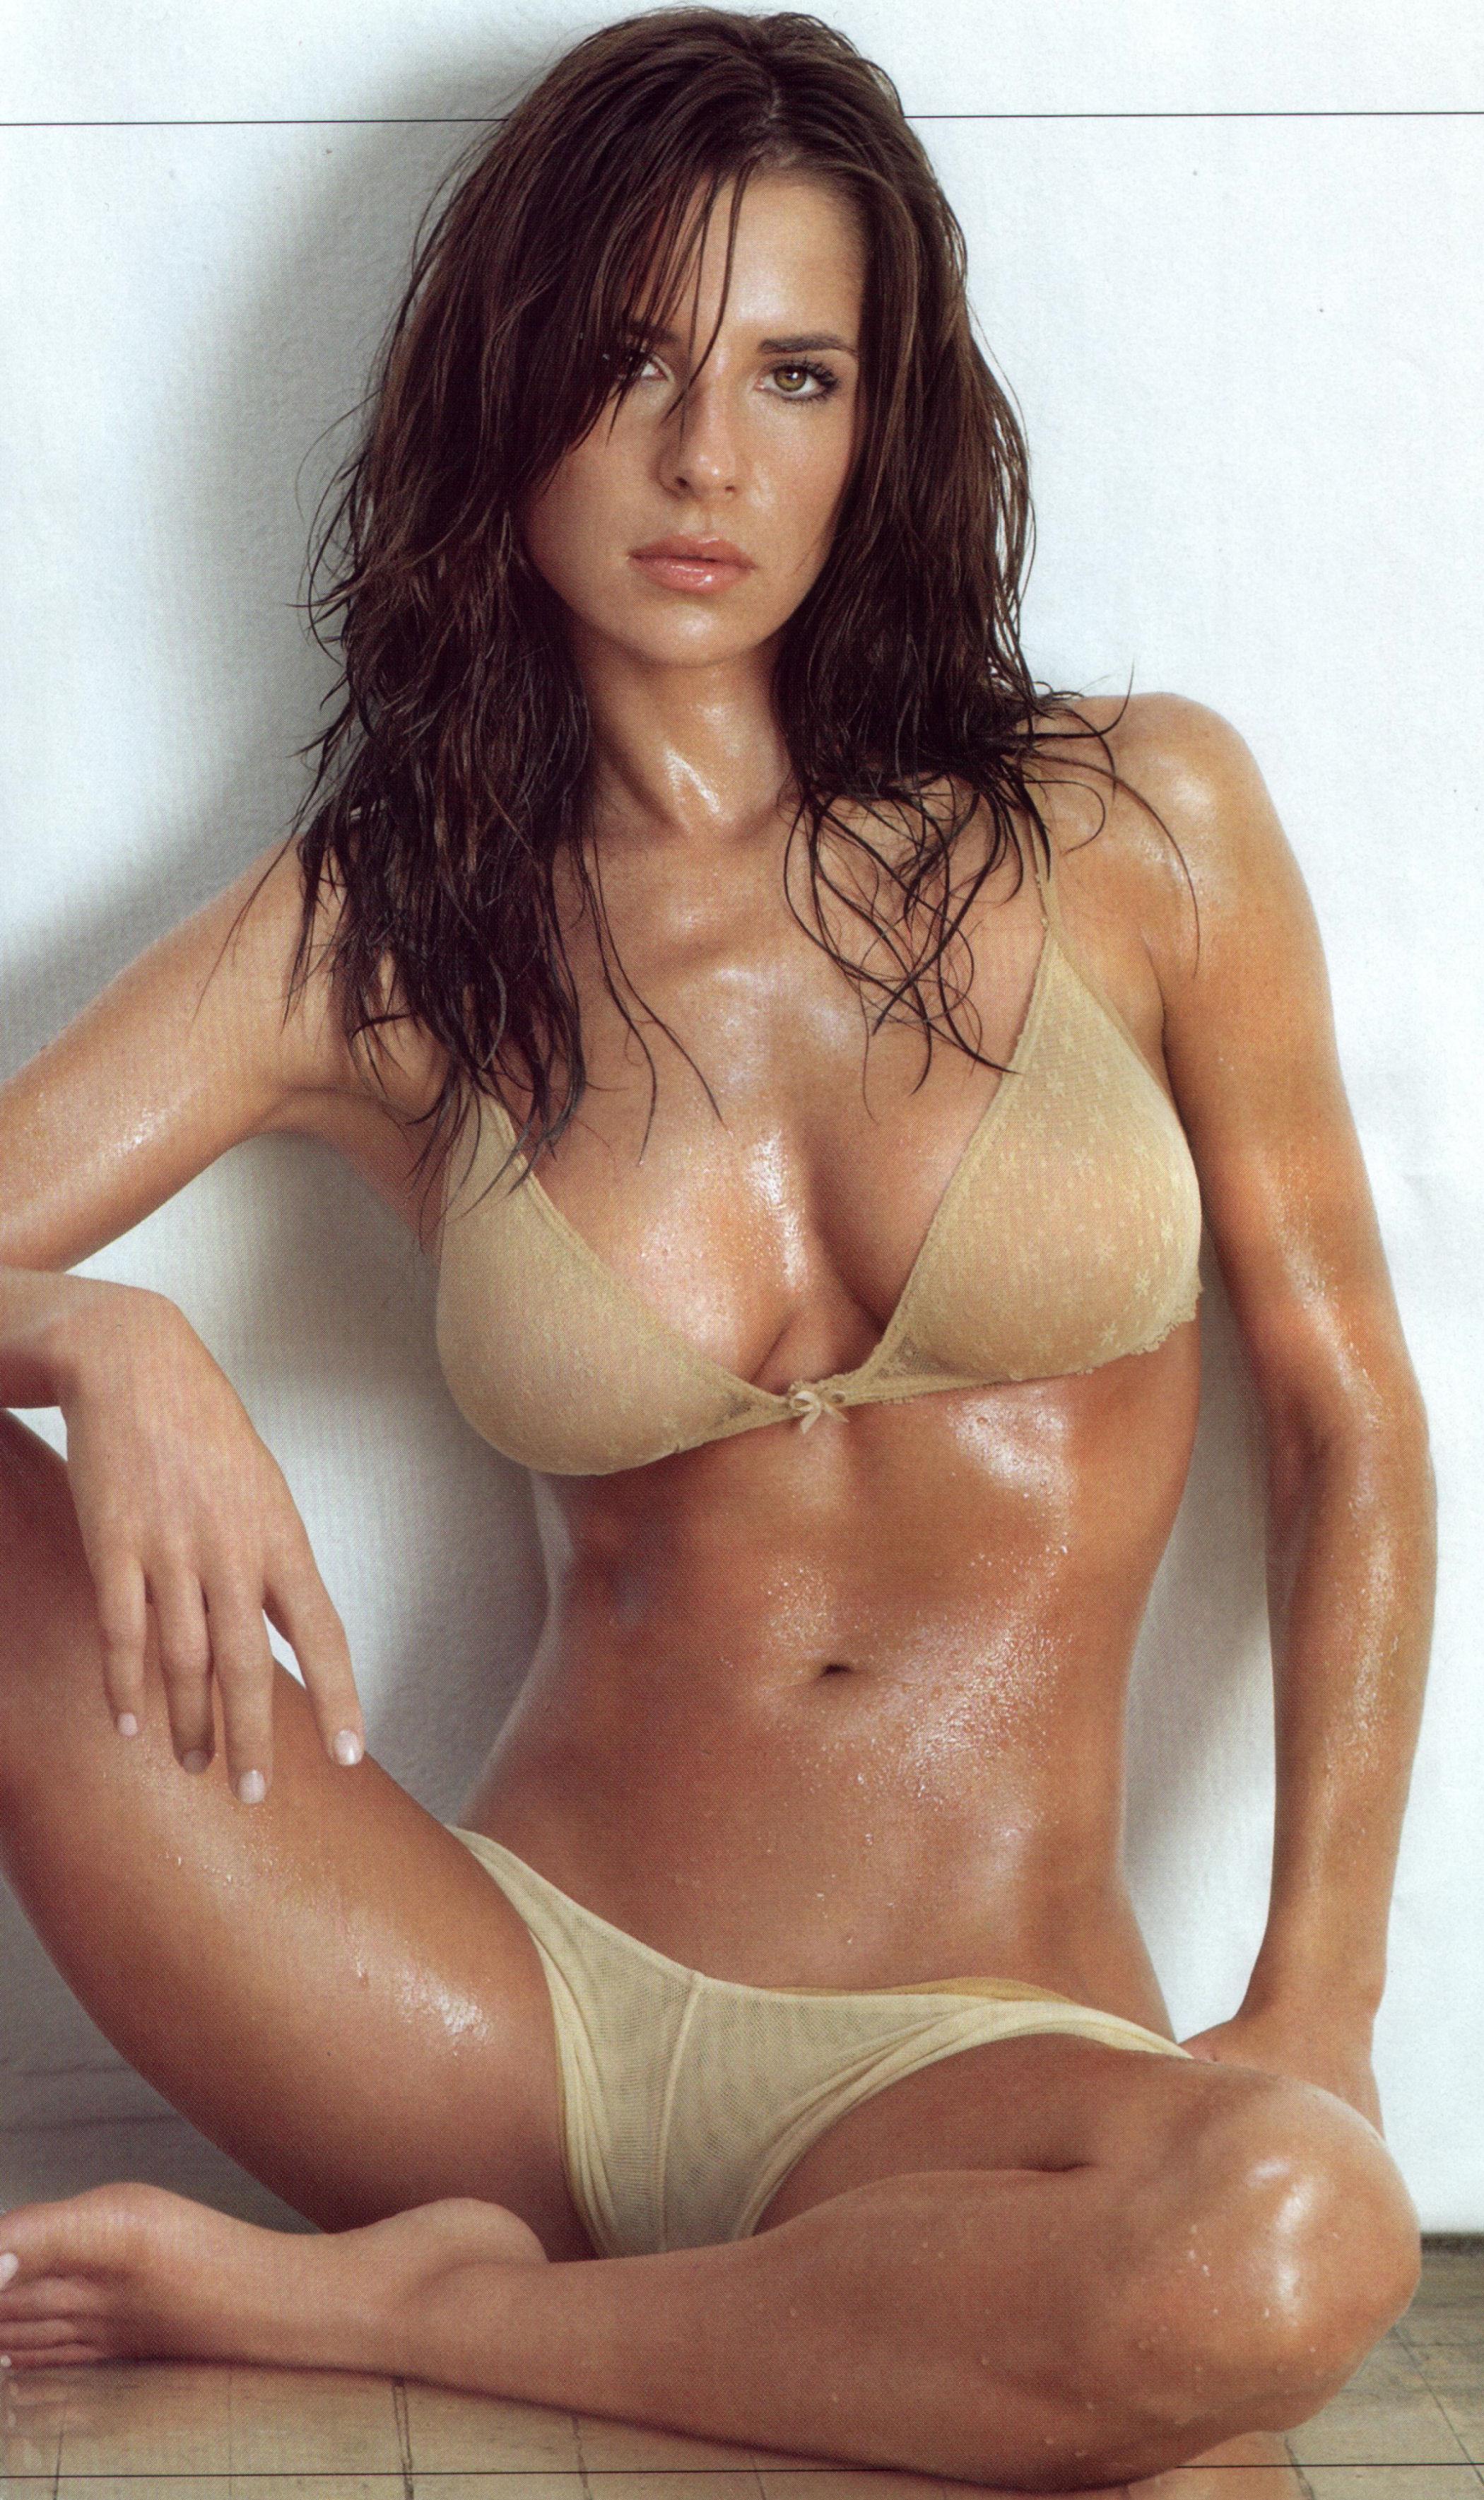 Sexy Hot Lottie Lyell  nudes (75 photo), Instagram, bra